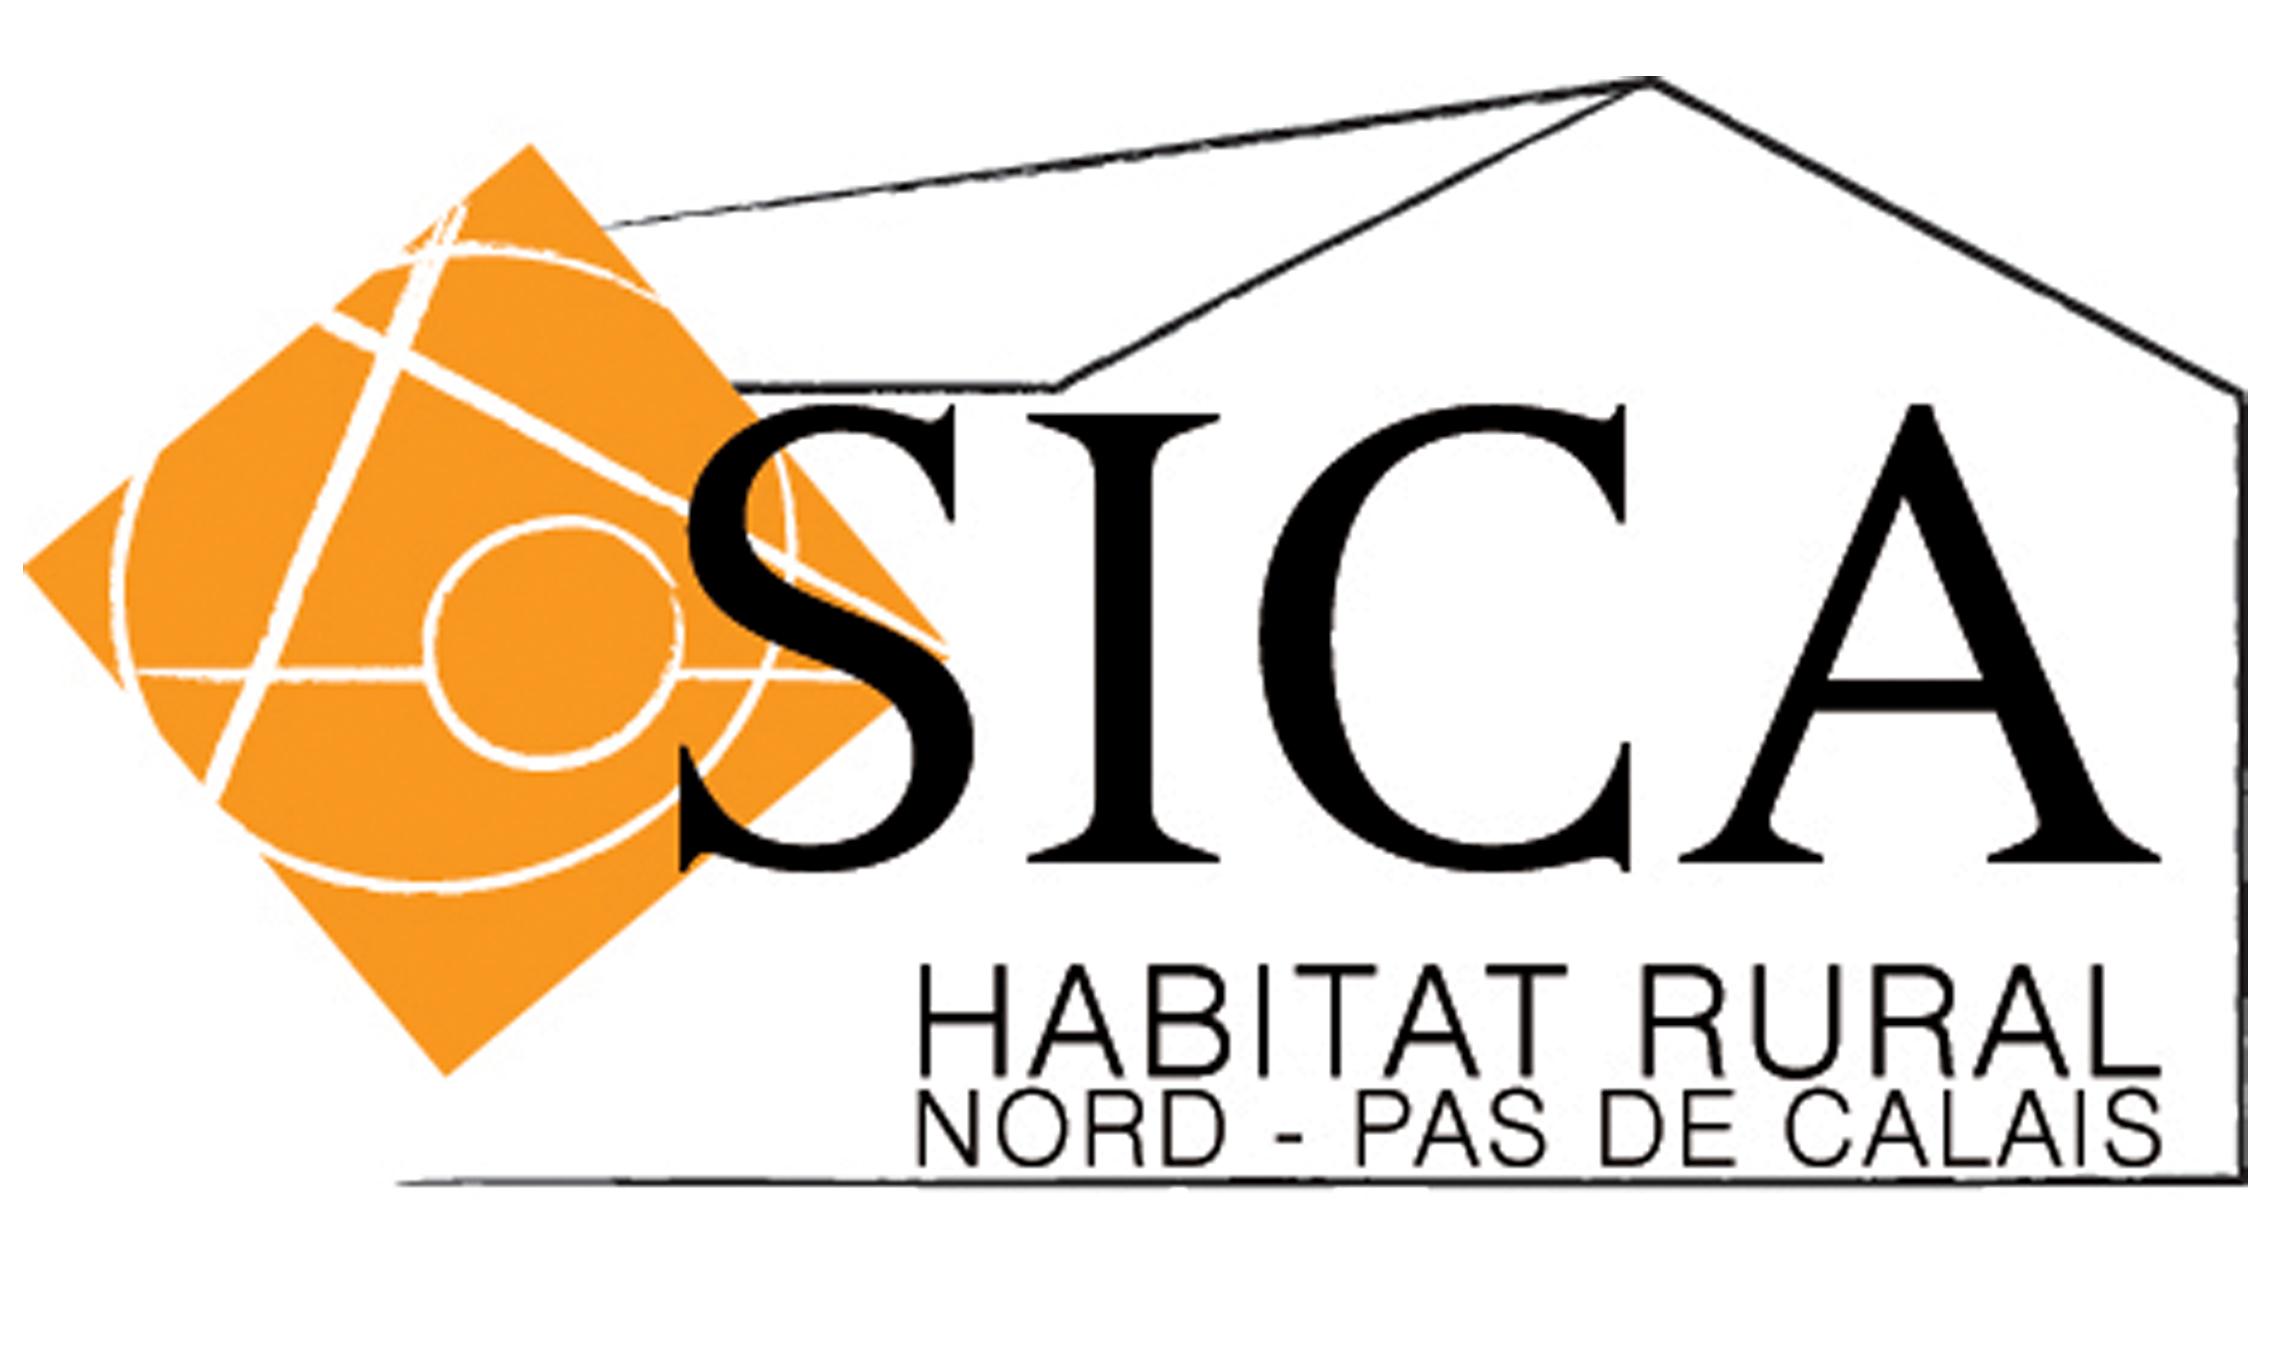 SICA Habitat Rural